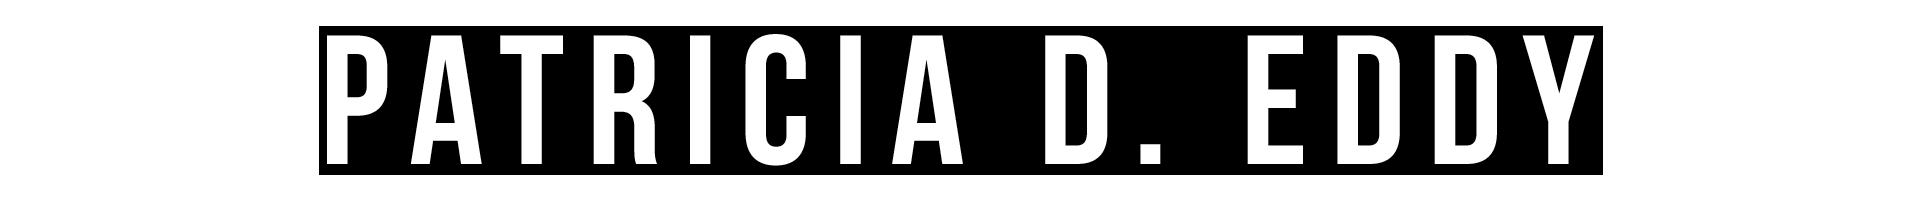 patricia new logo